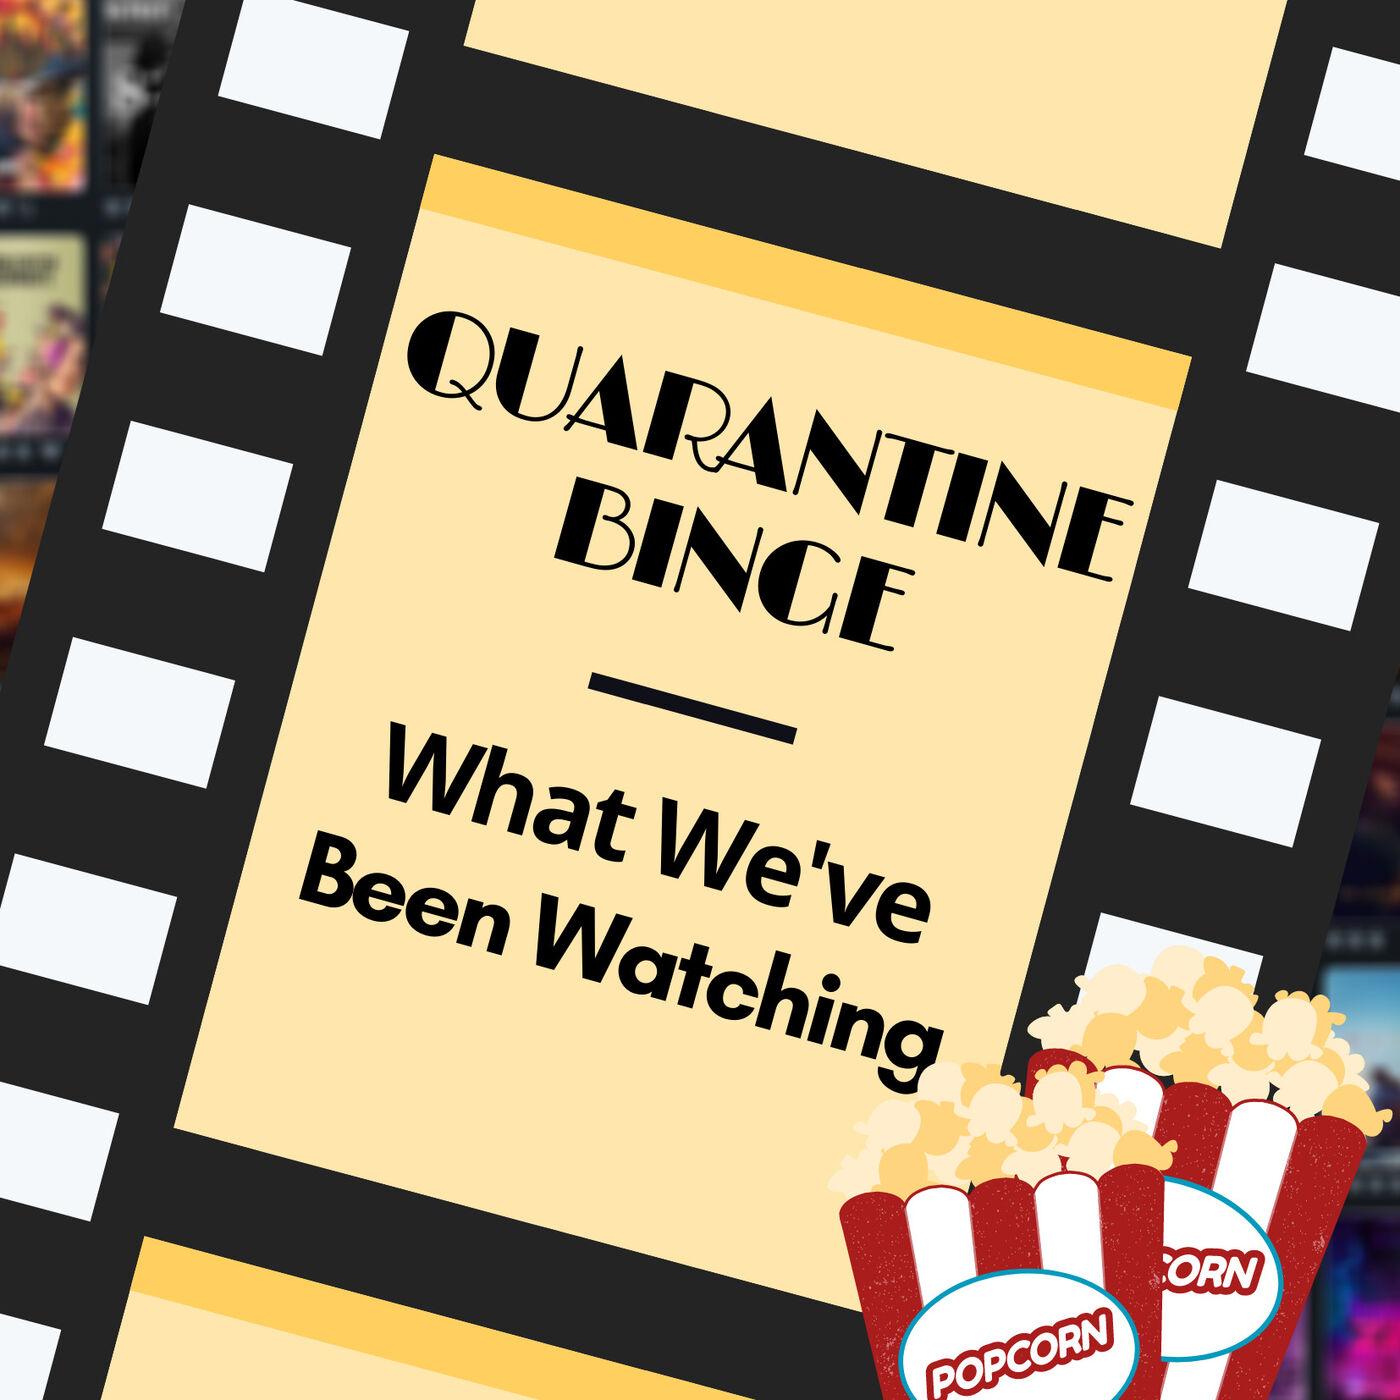 Quarantine Binge: What We've Been Watching